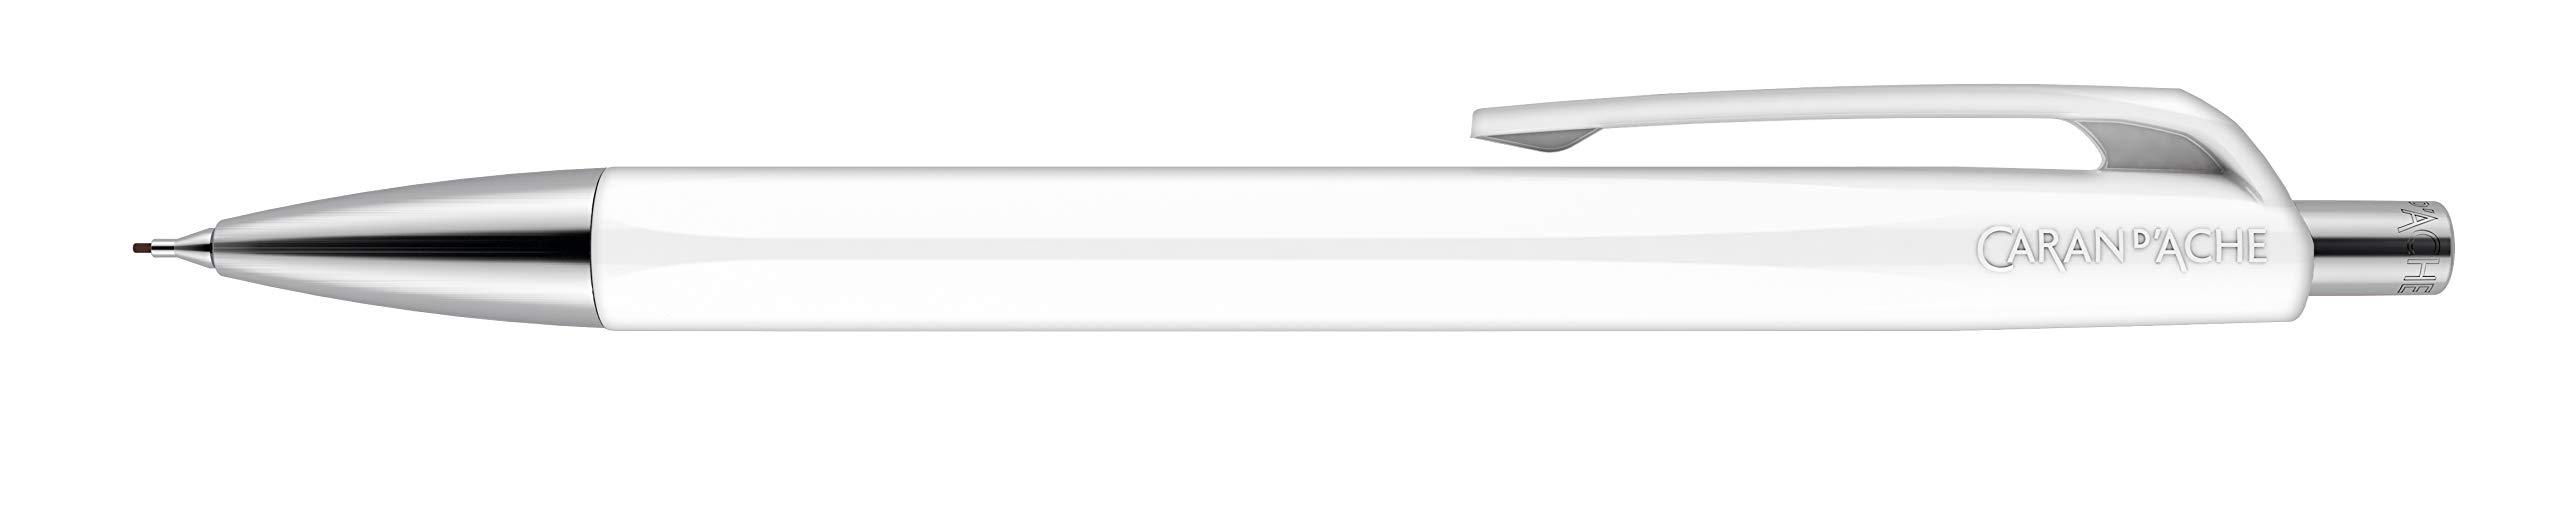 CARAN DACHE 888 Infinito Lápiz Mecánico - Blanco